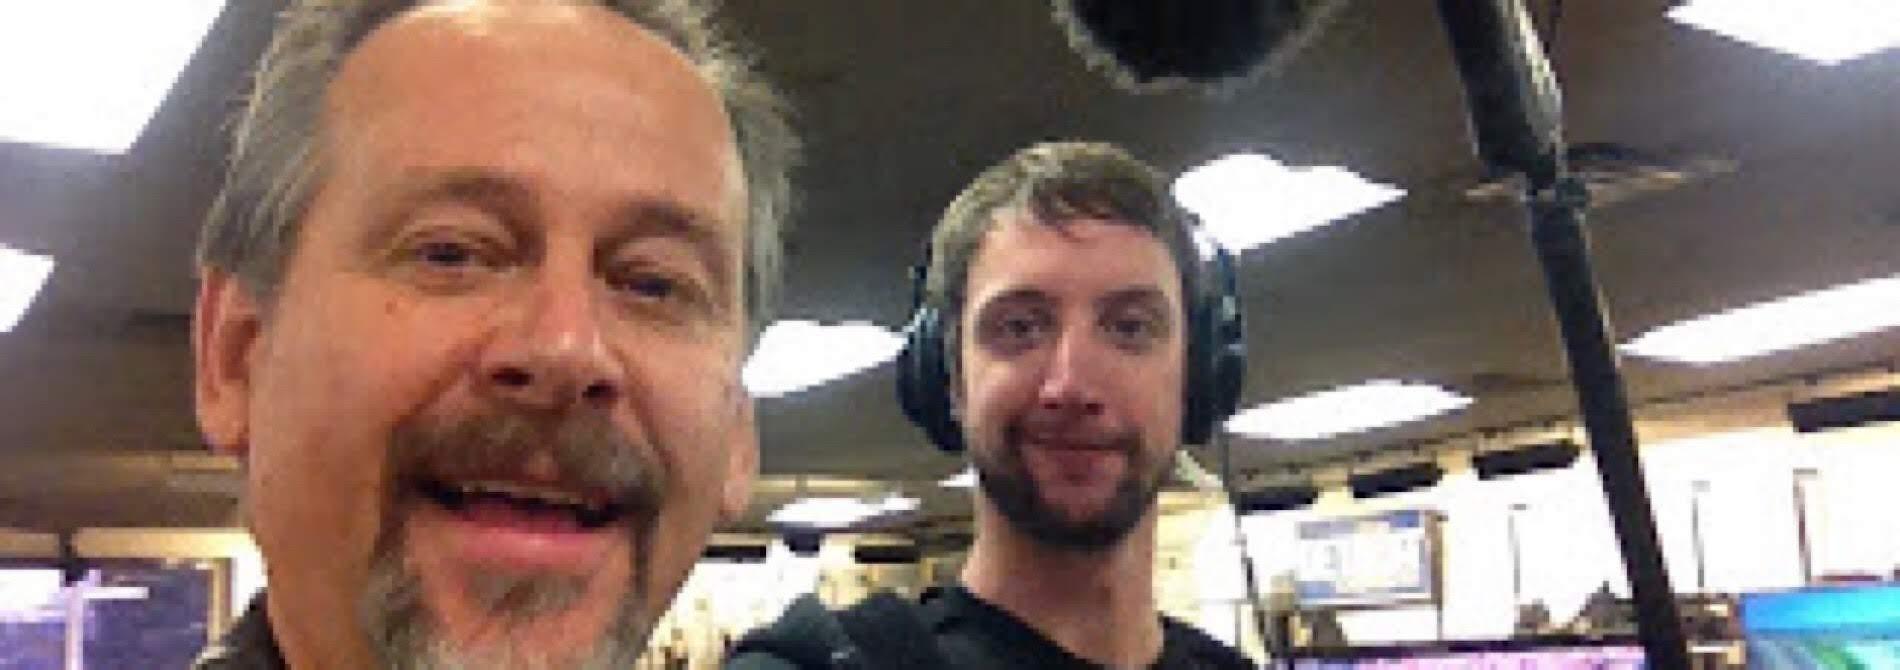 2 guys under a boom mic